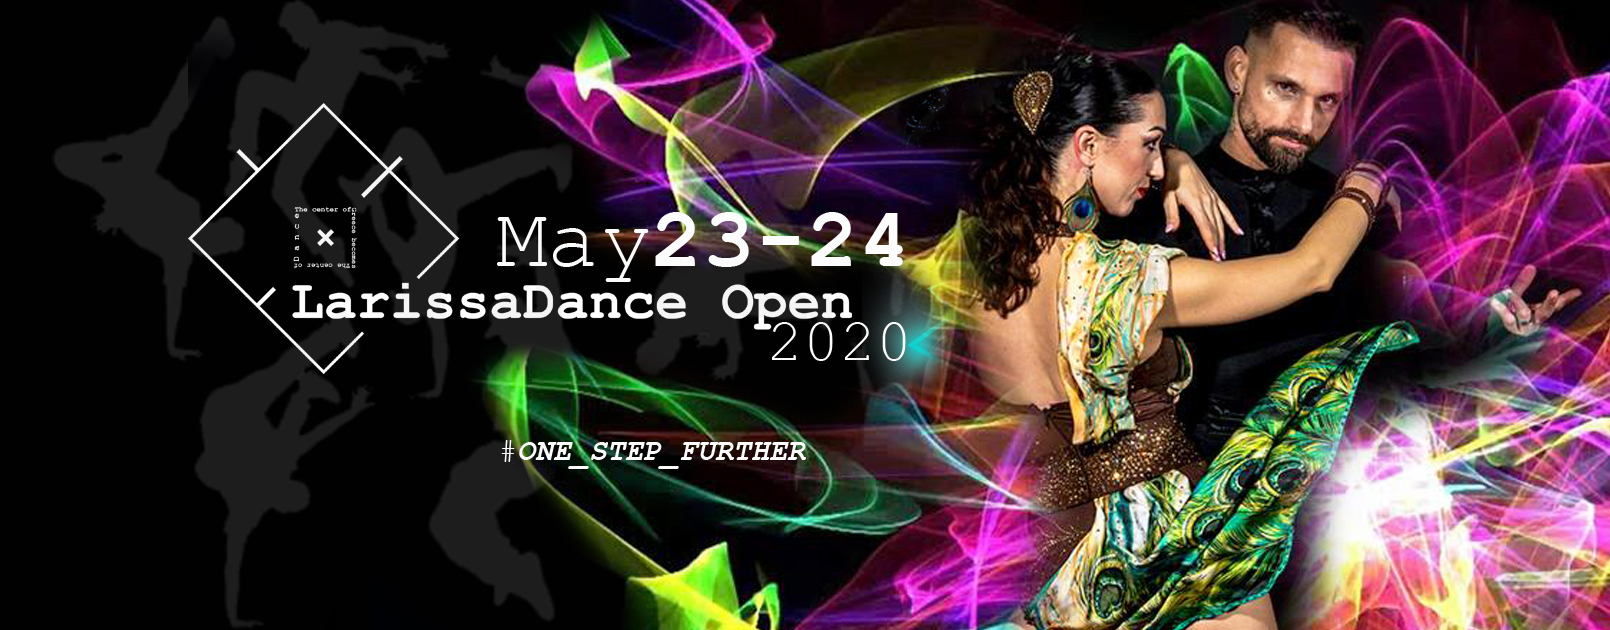 larissa dance open 2020